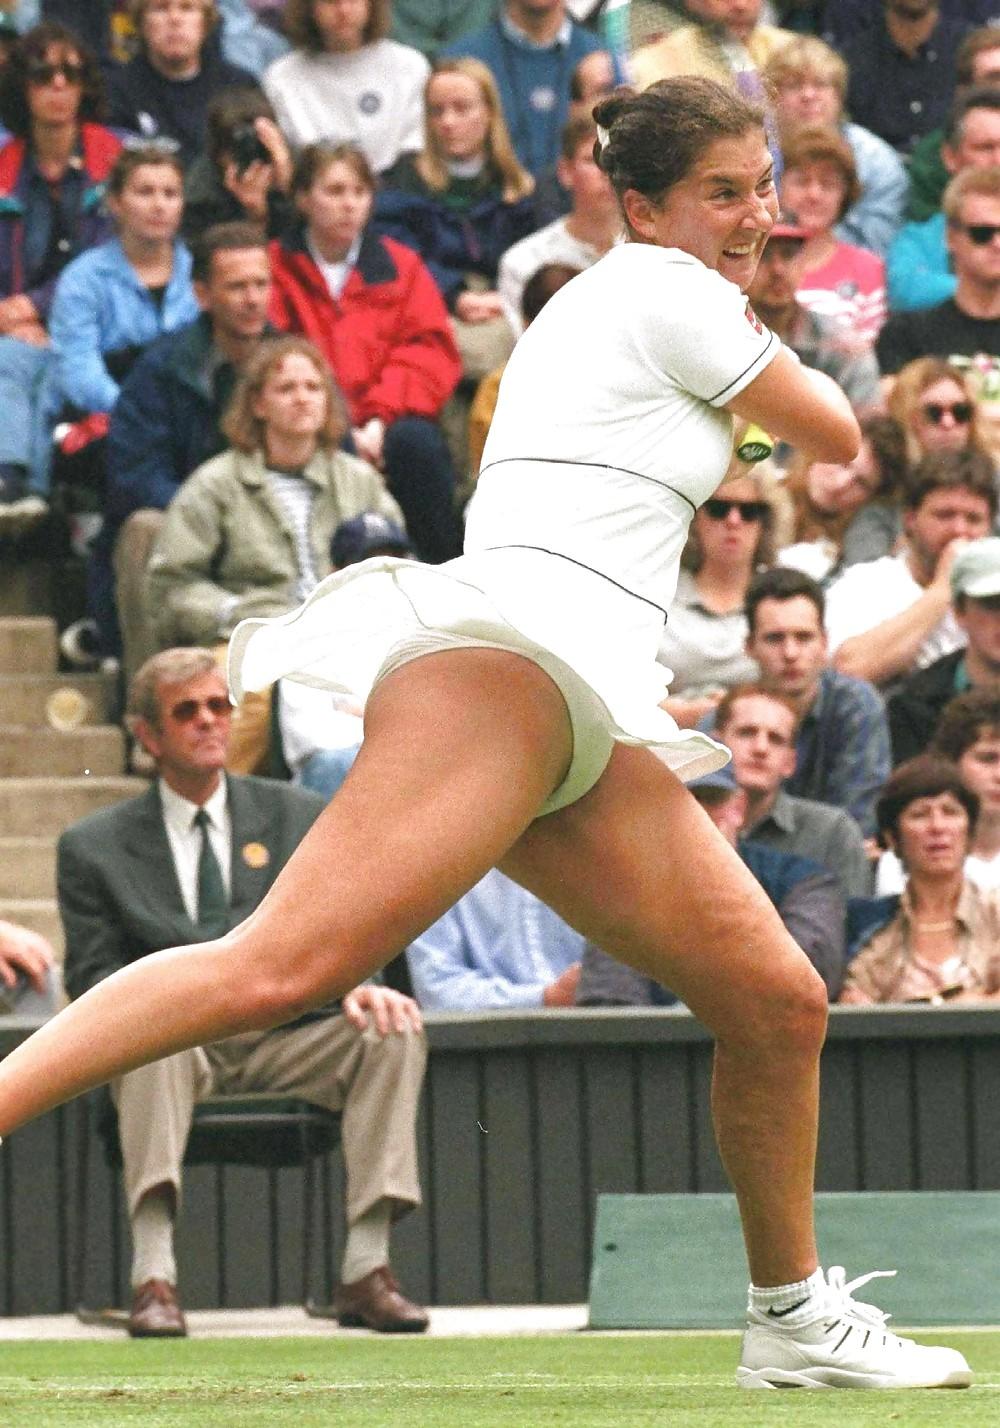 Tennis voyeur upskirt